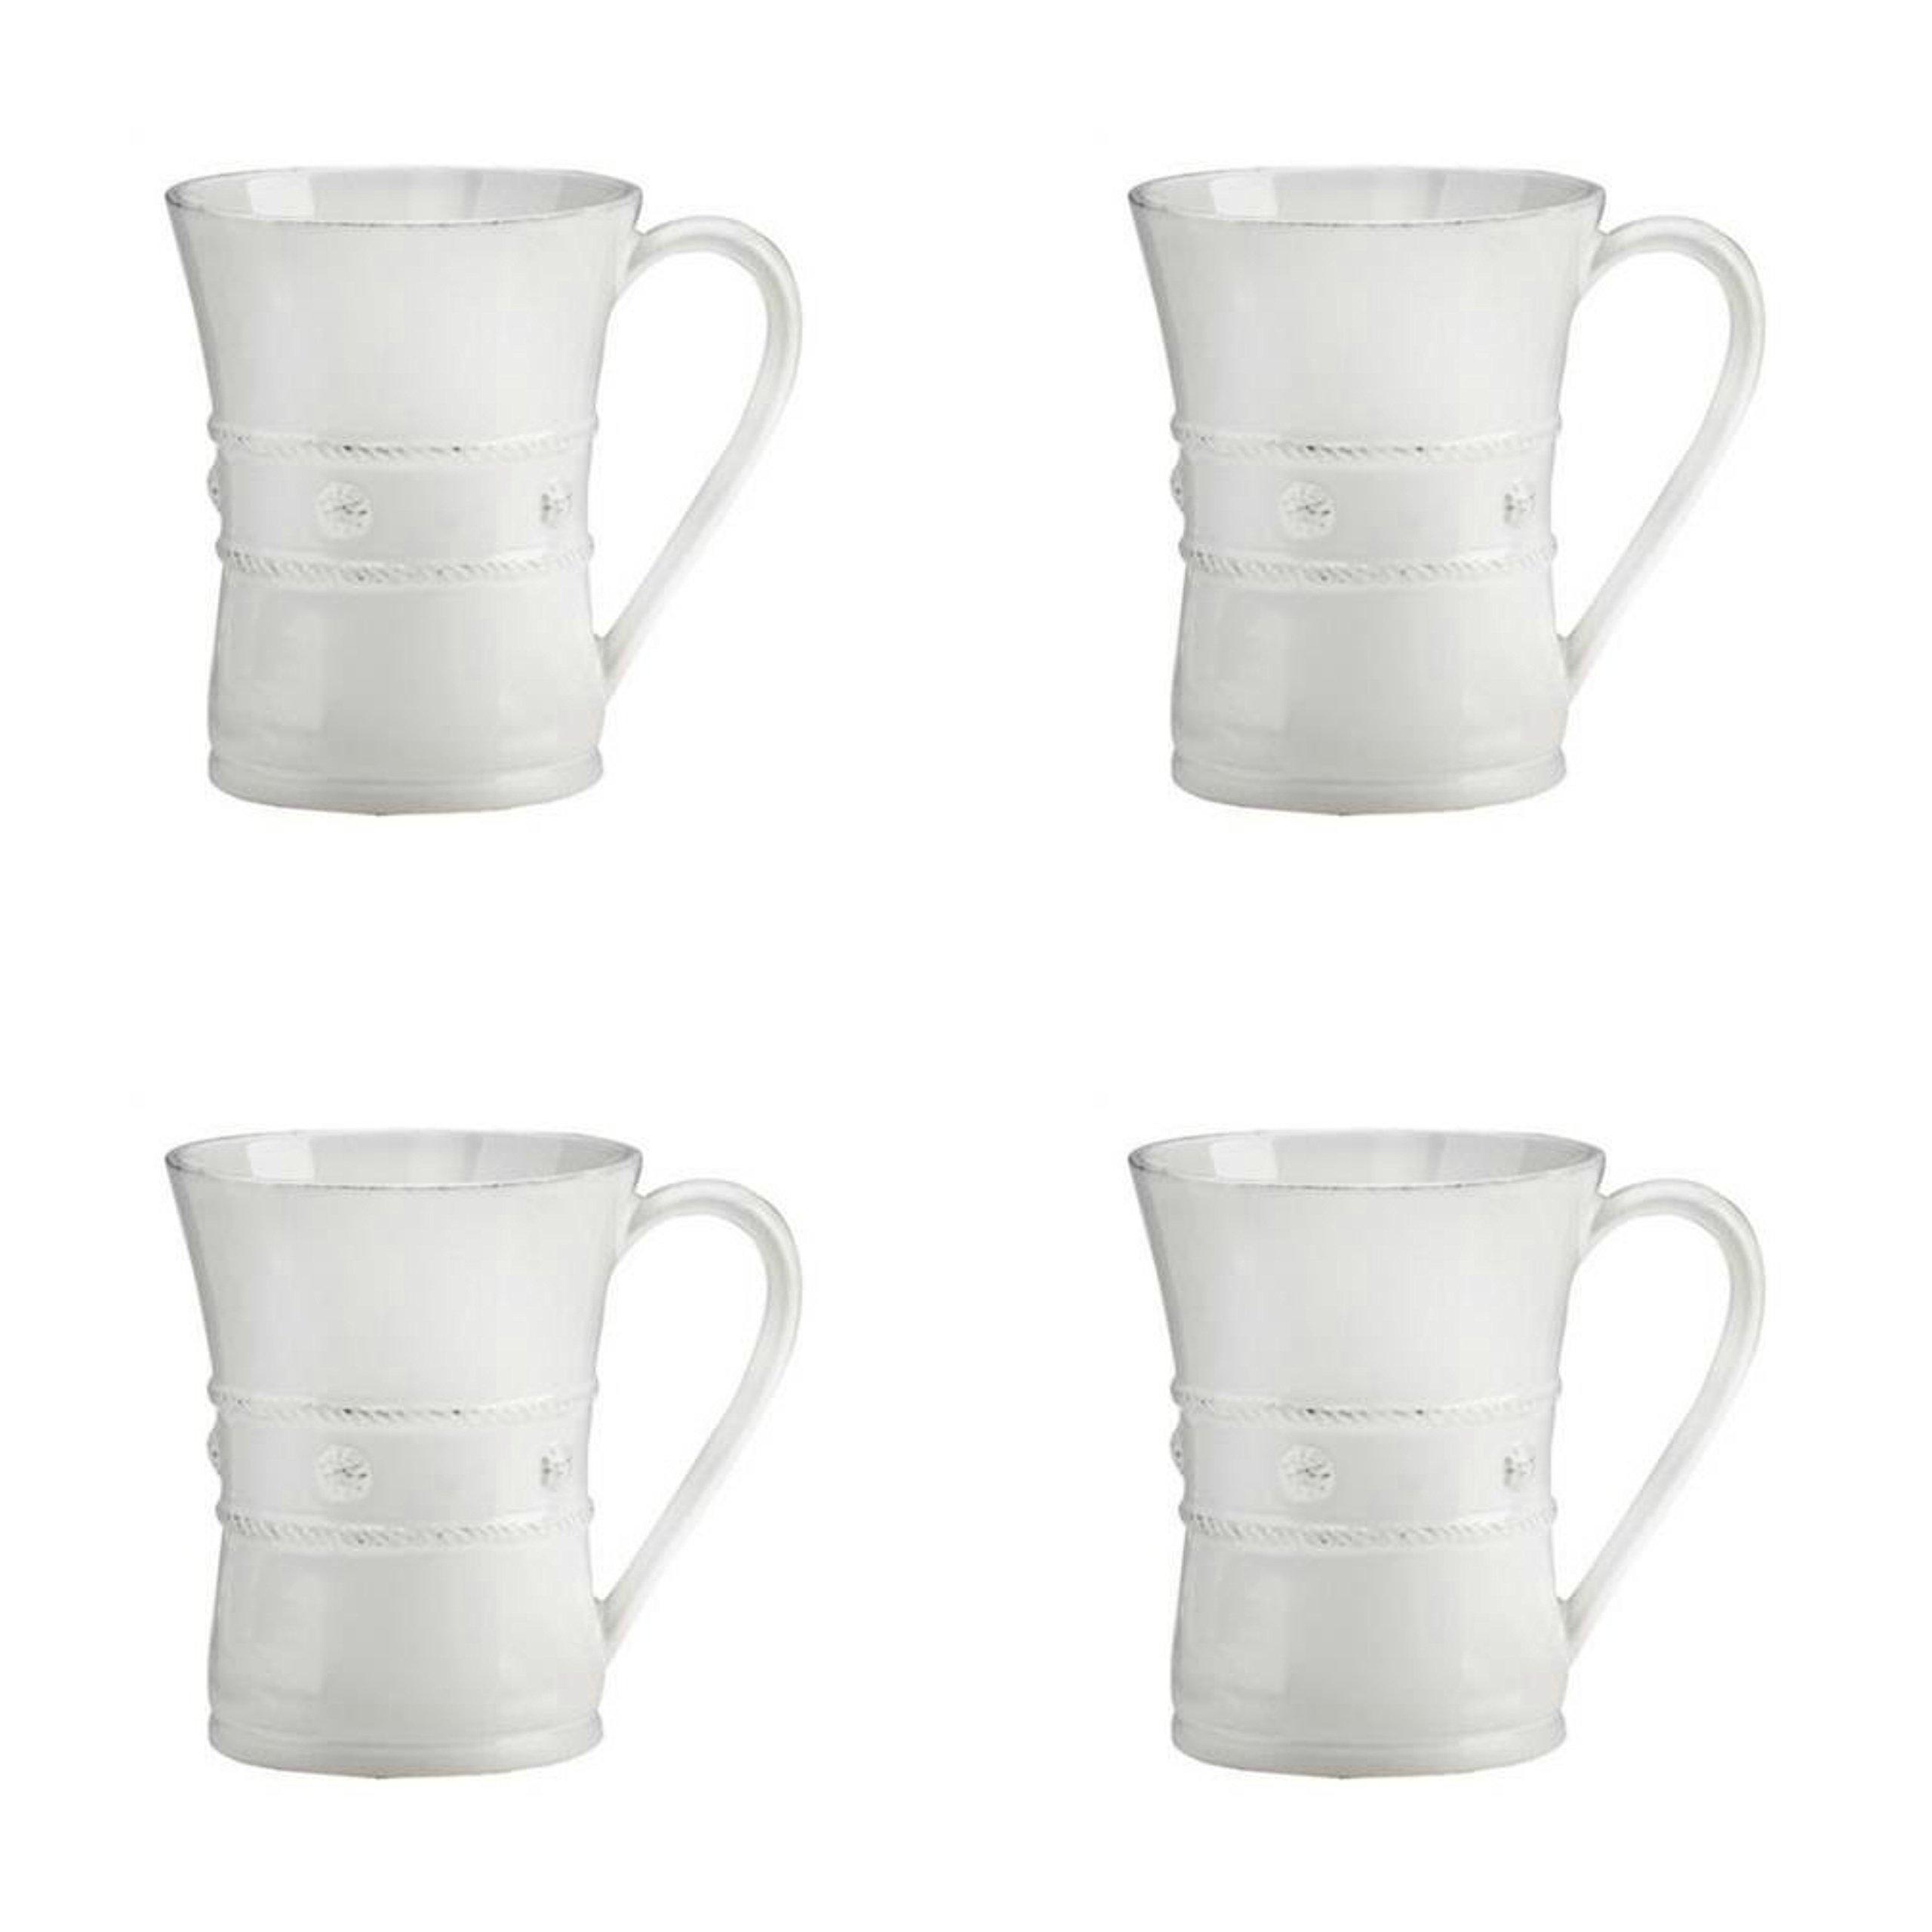 Juliska Berry & Thread 13 oz Coffee Mug, Whitewash (4)